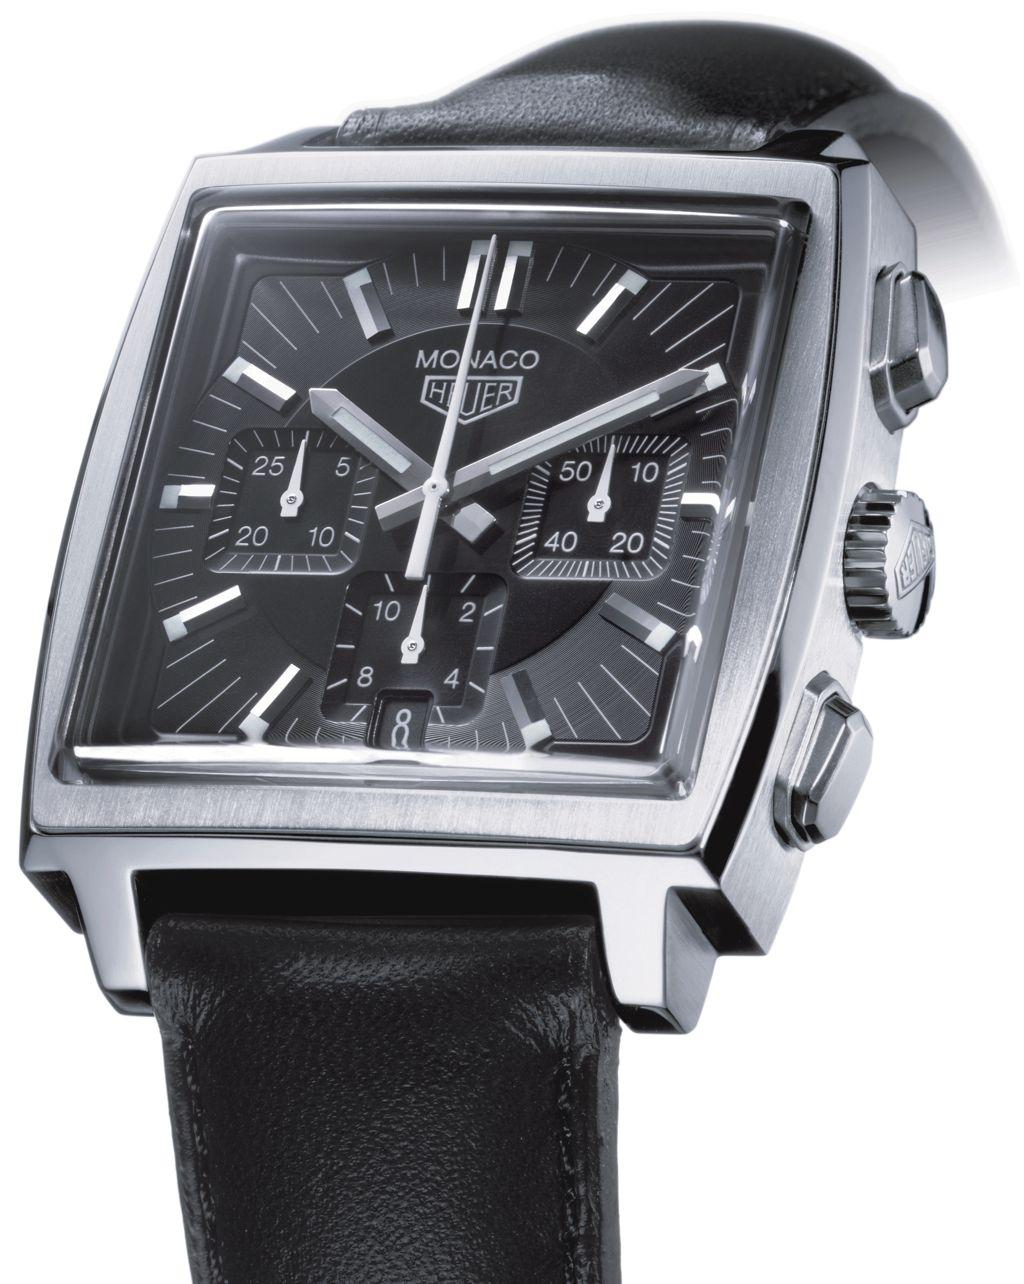 10 relojes elegantes Monaco-Re-edition7